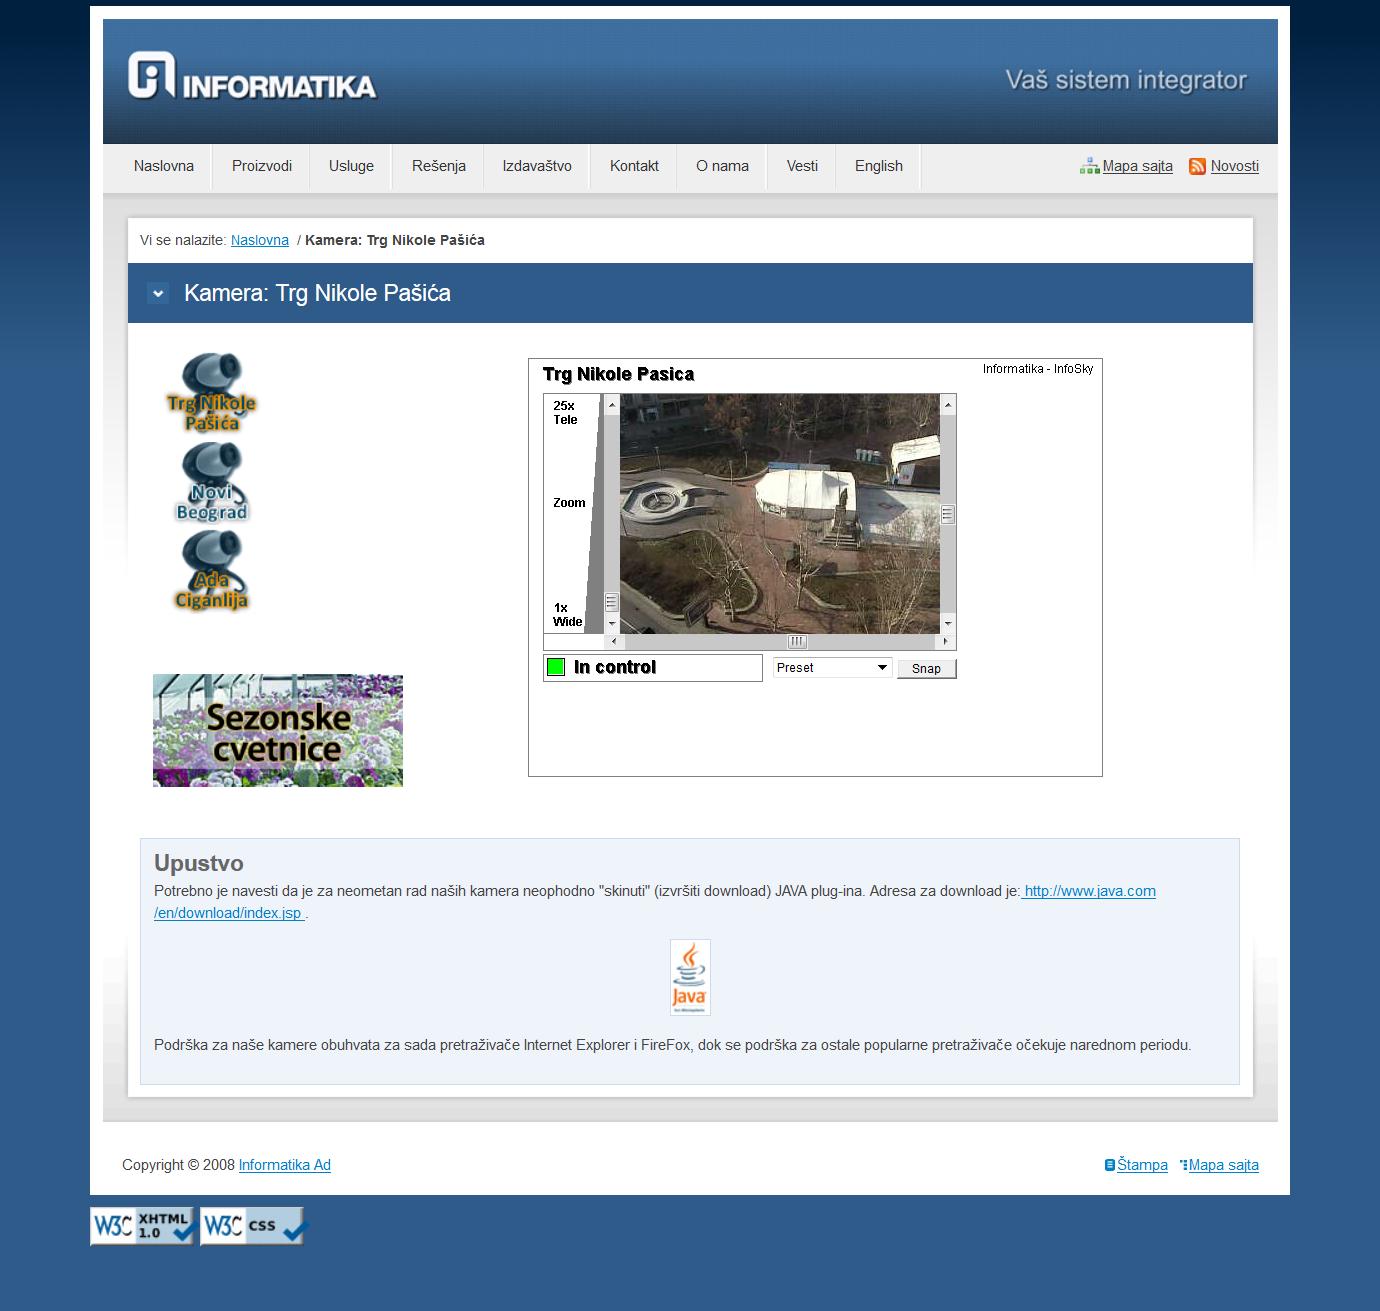 mapa kamera beograd WebCams: 2014 mapa kamera beograd